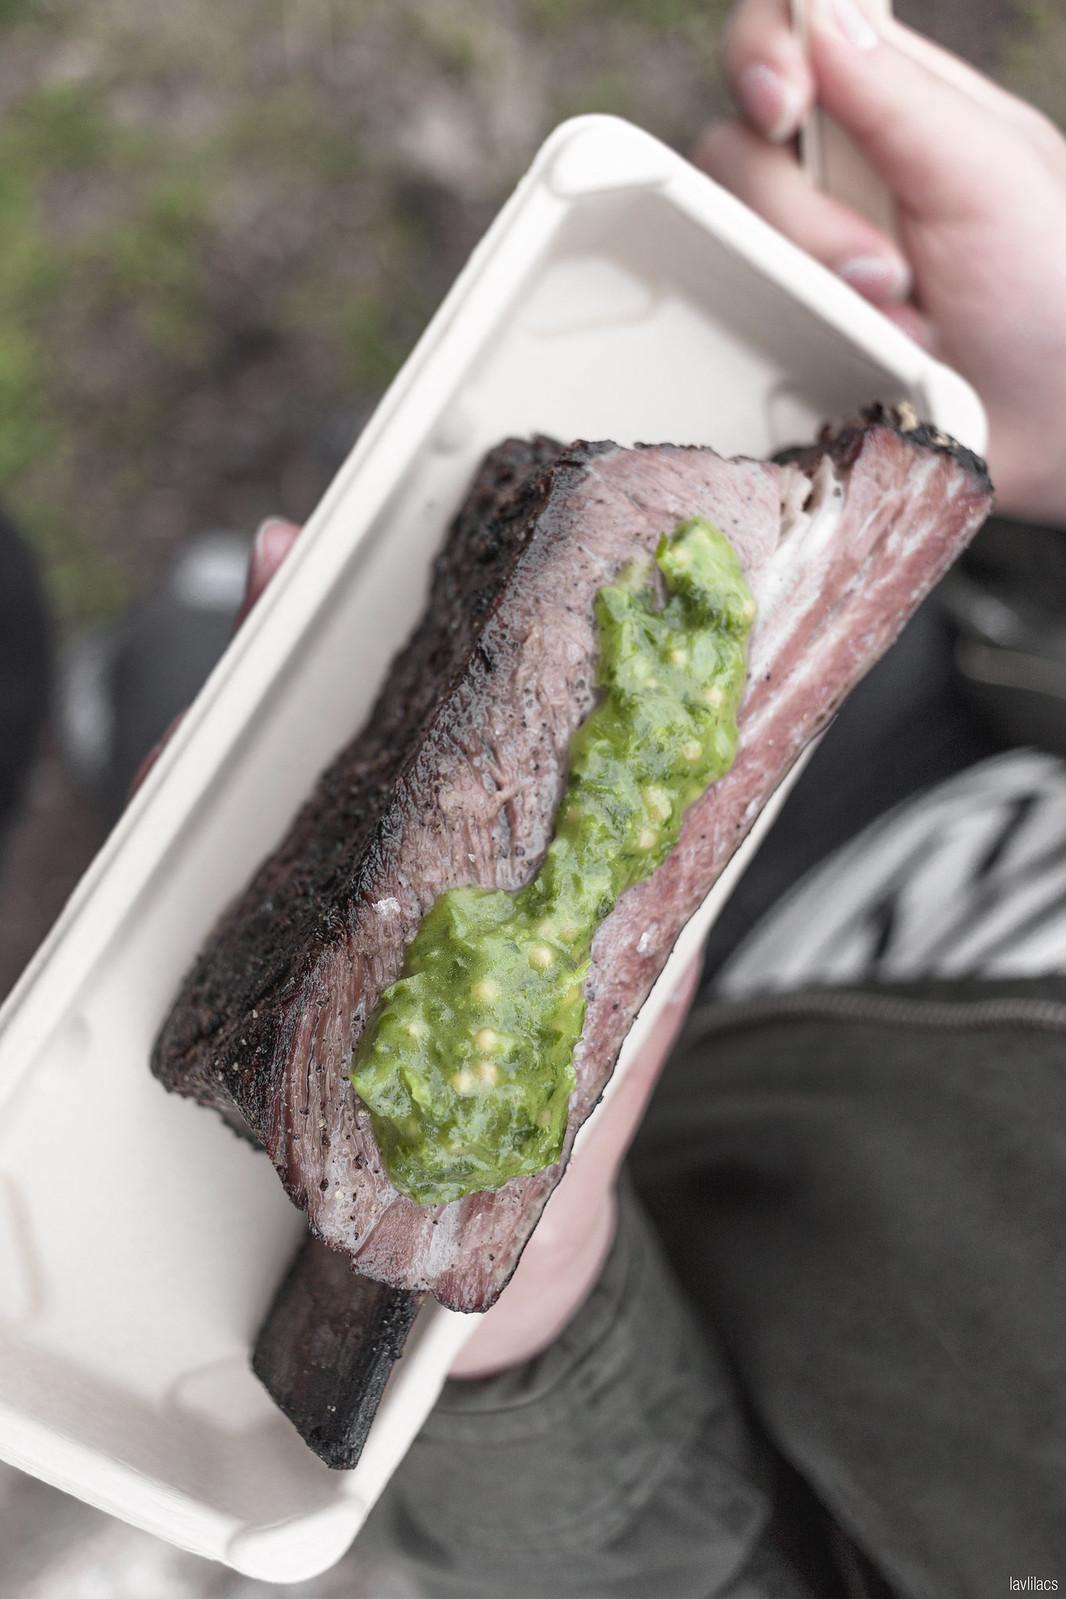 lavlilacs Smorgasburg Carnal Beef Short Rib and Bone Marrow